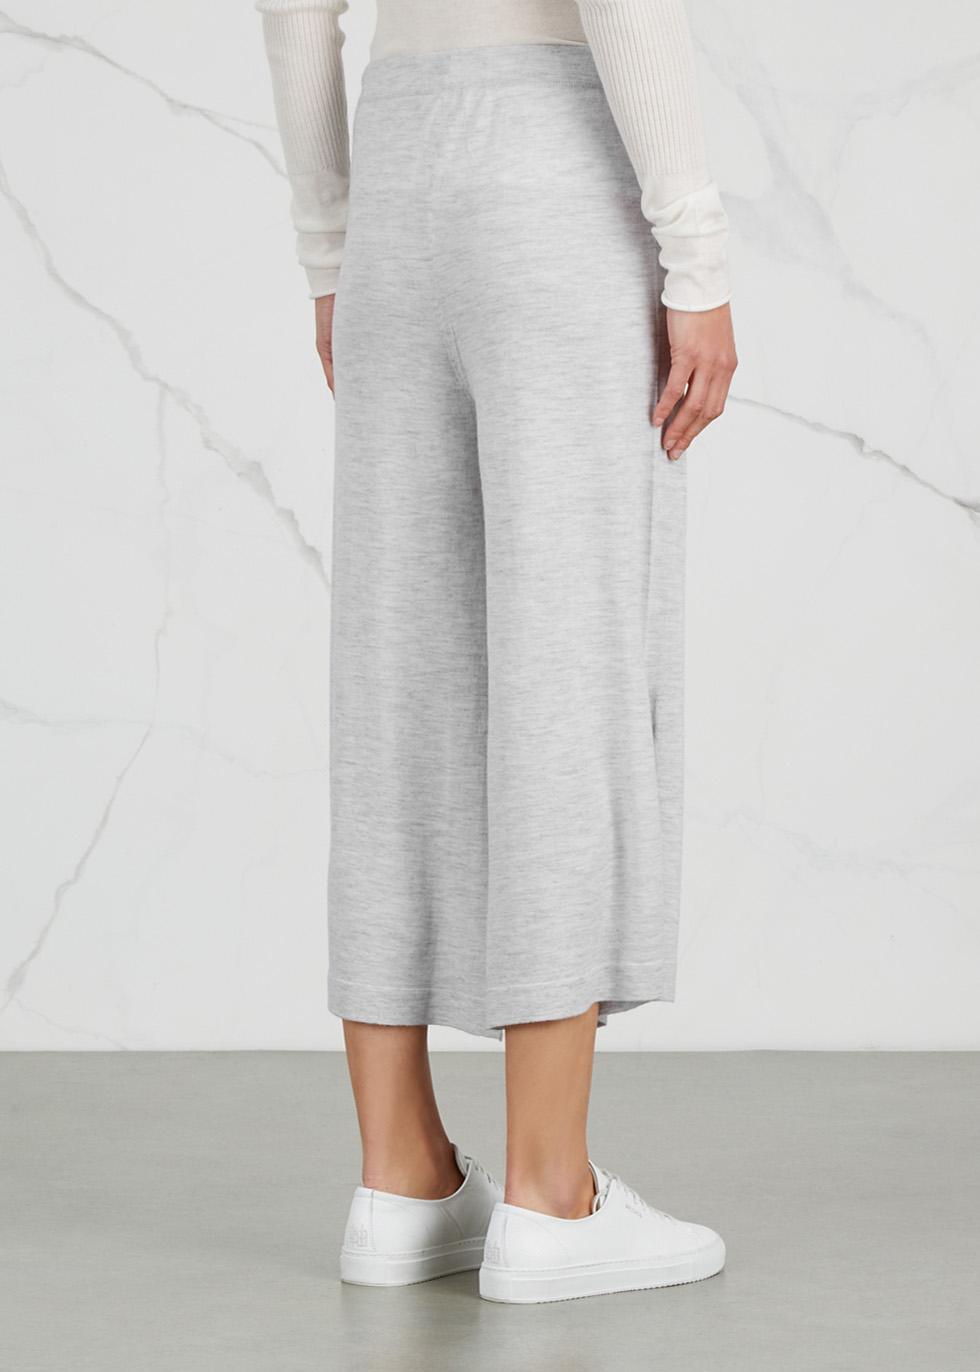 Thane cropped cashmere trousers - Le Kasha